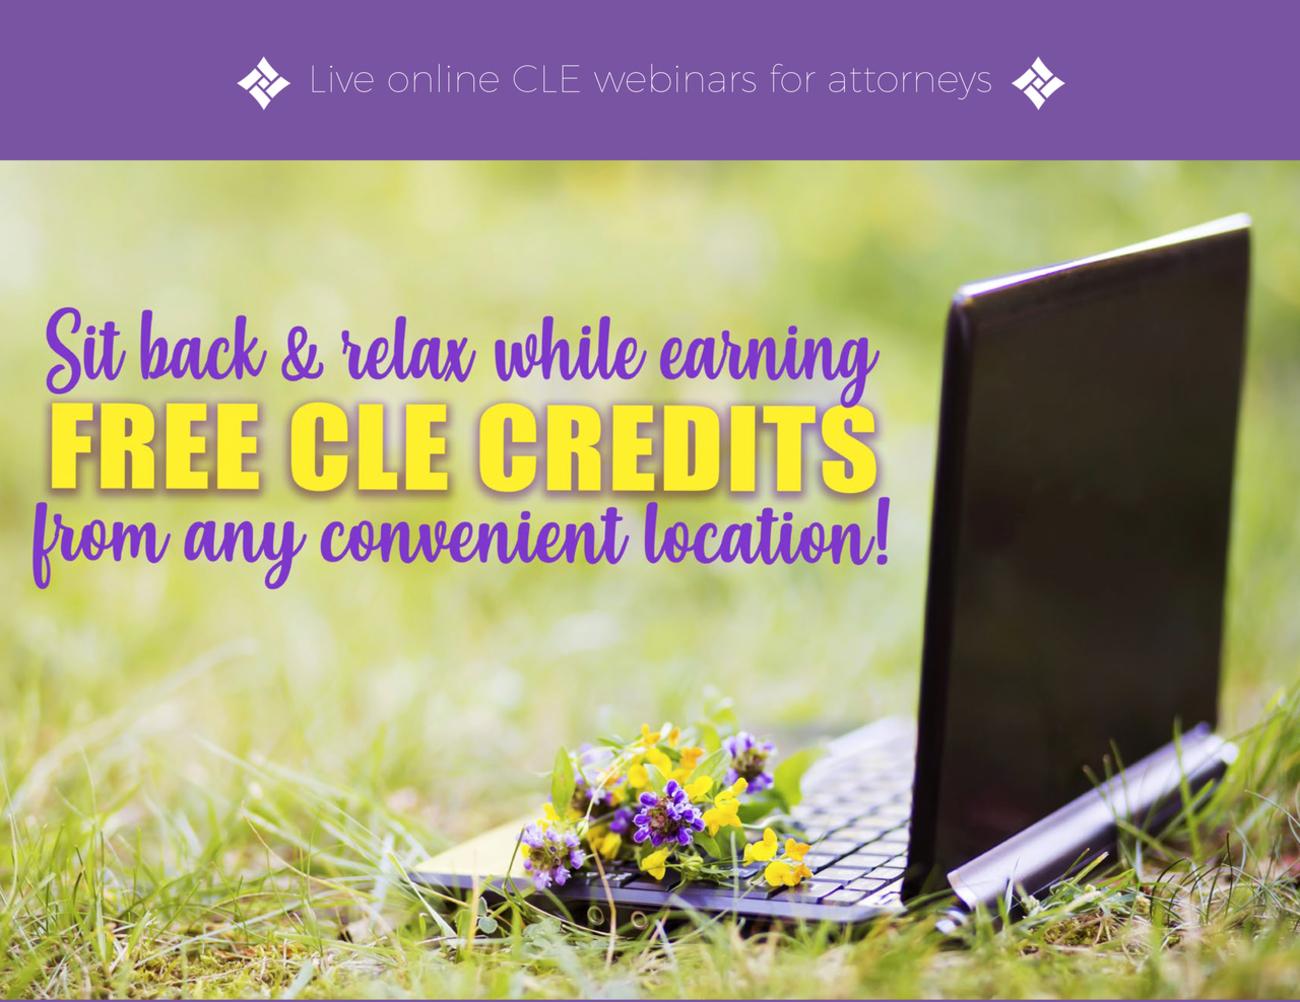 Live online CLE webinars for attorneys